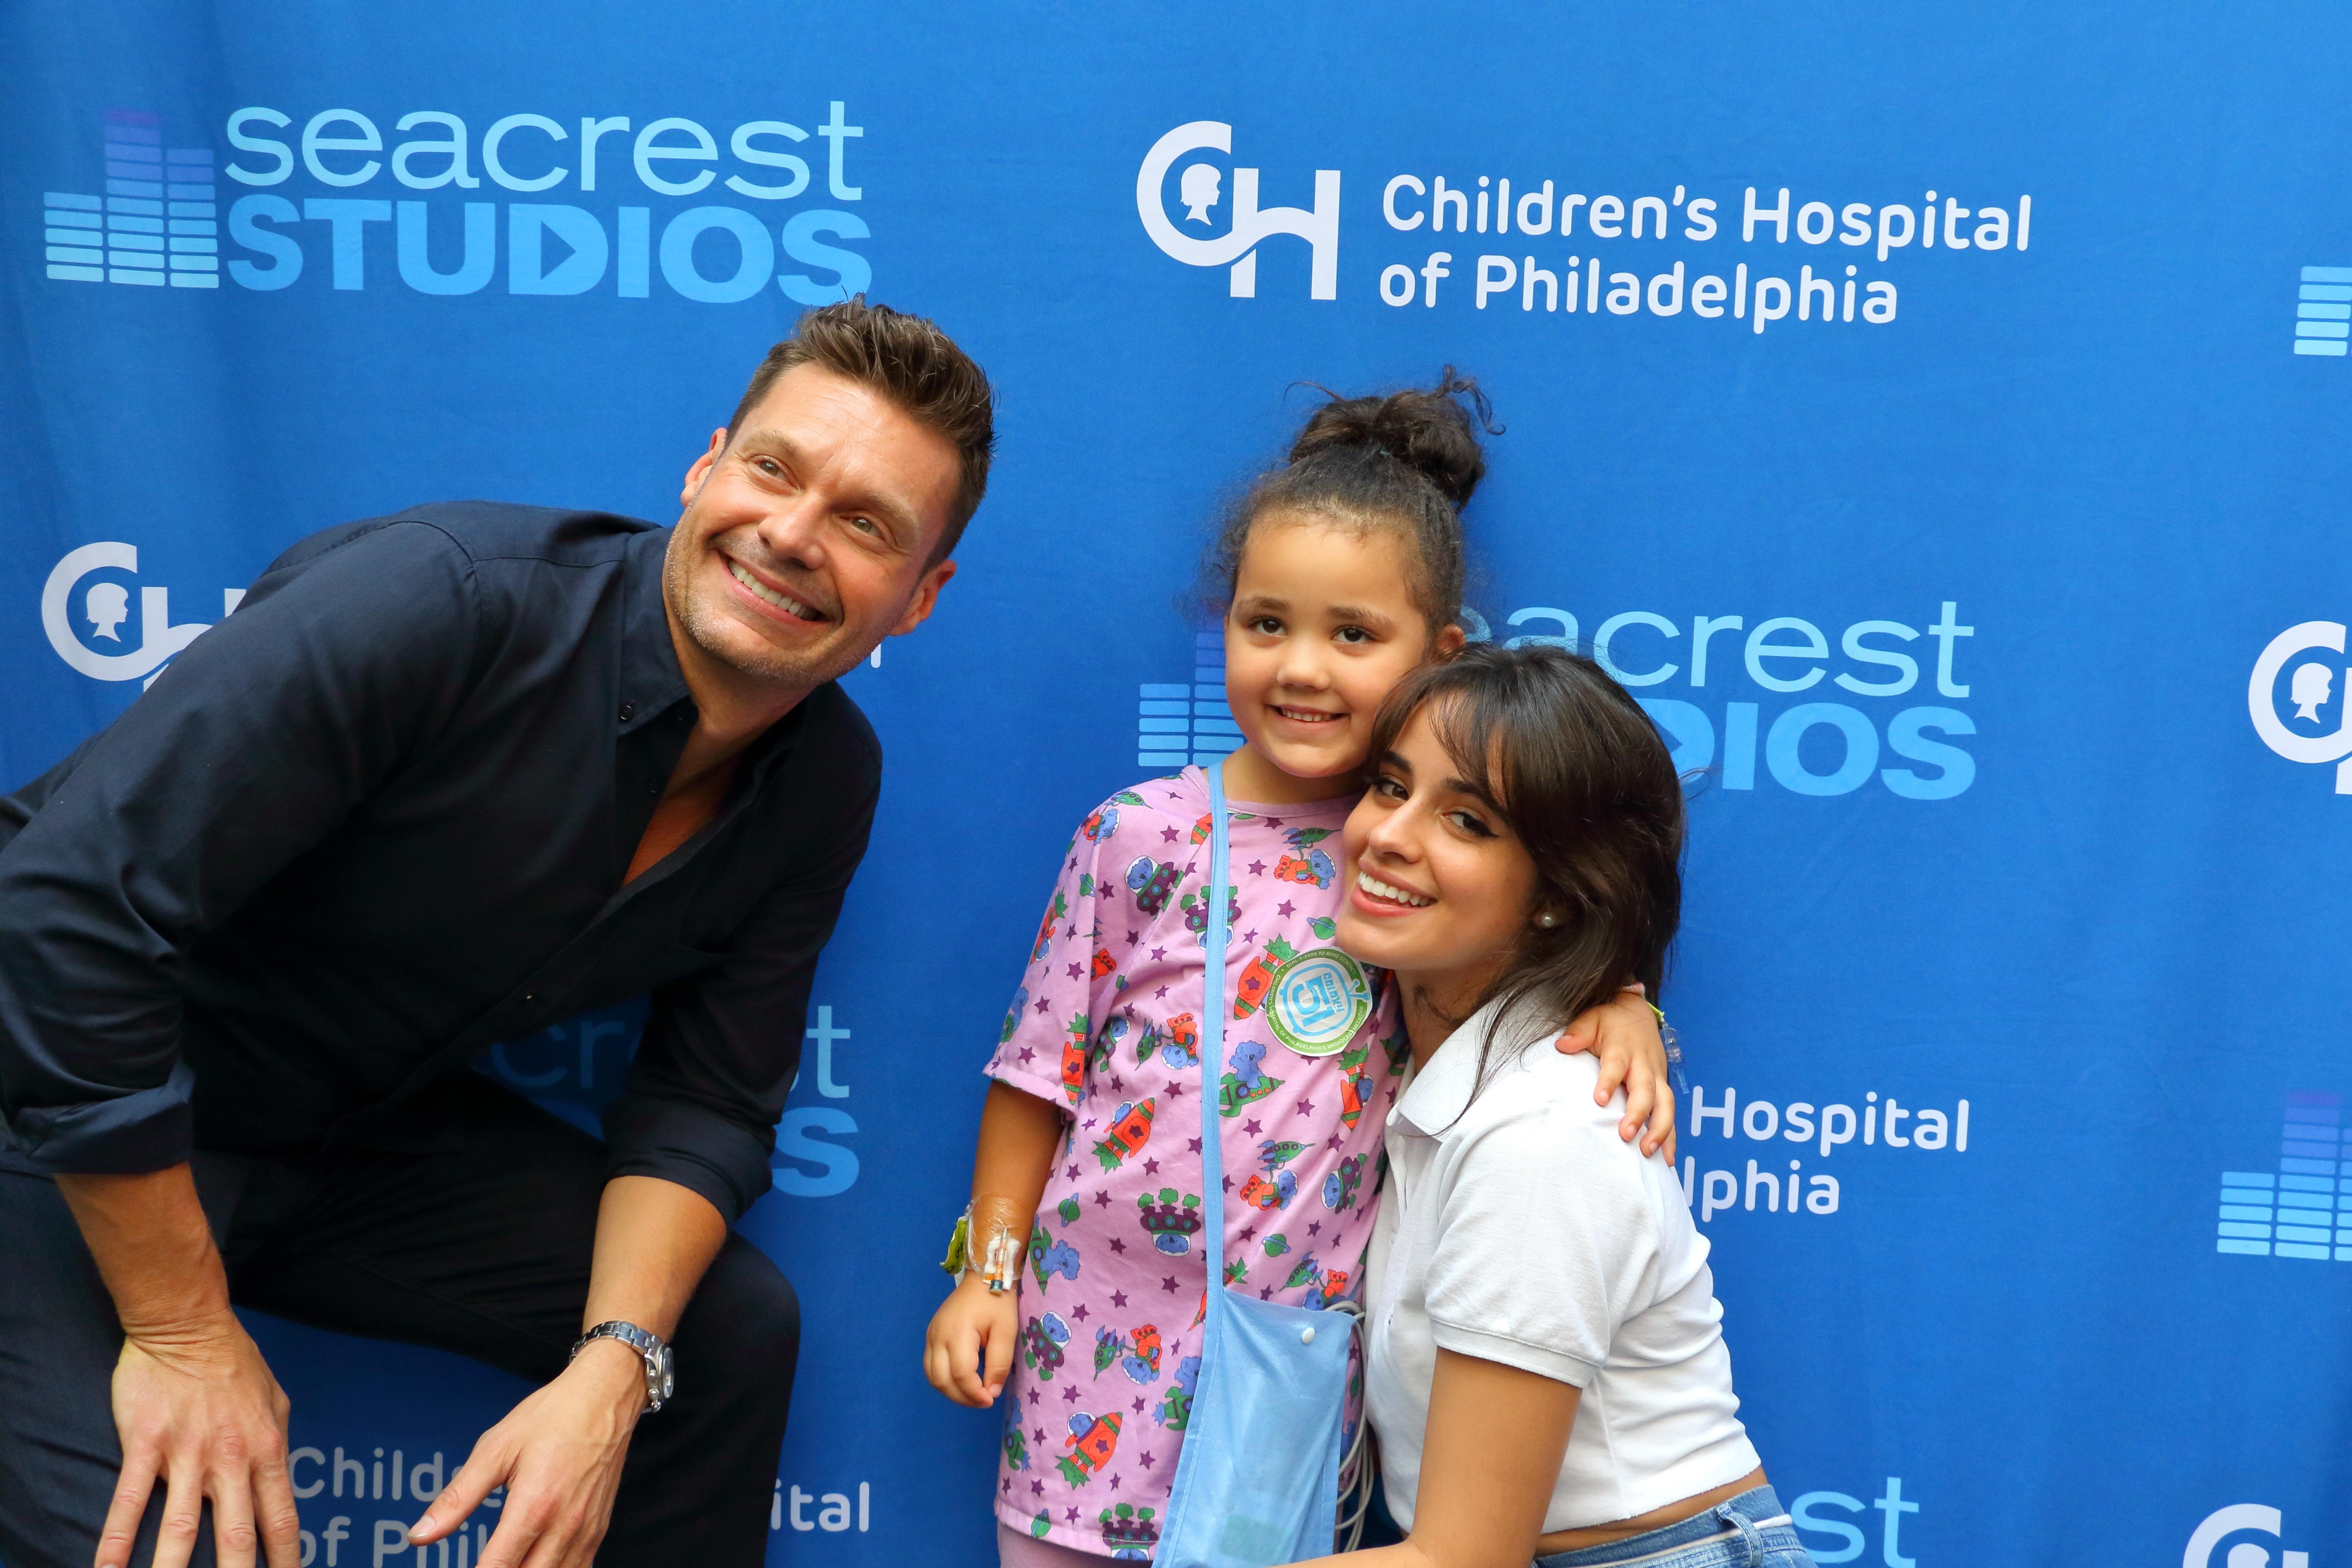 LIVE in Seacrest Studios at Children's Hospital of Philadelphia with Ryan Seacrest and Camila Cabello!